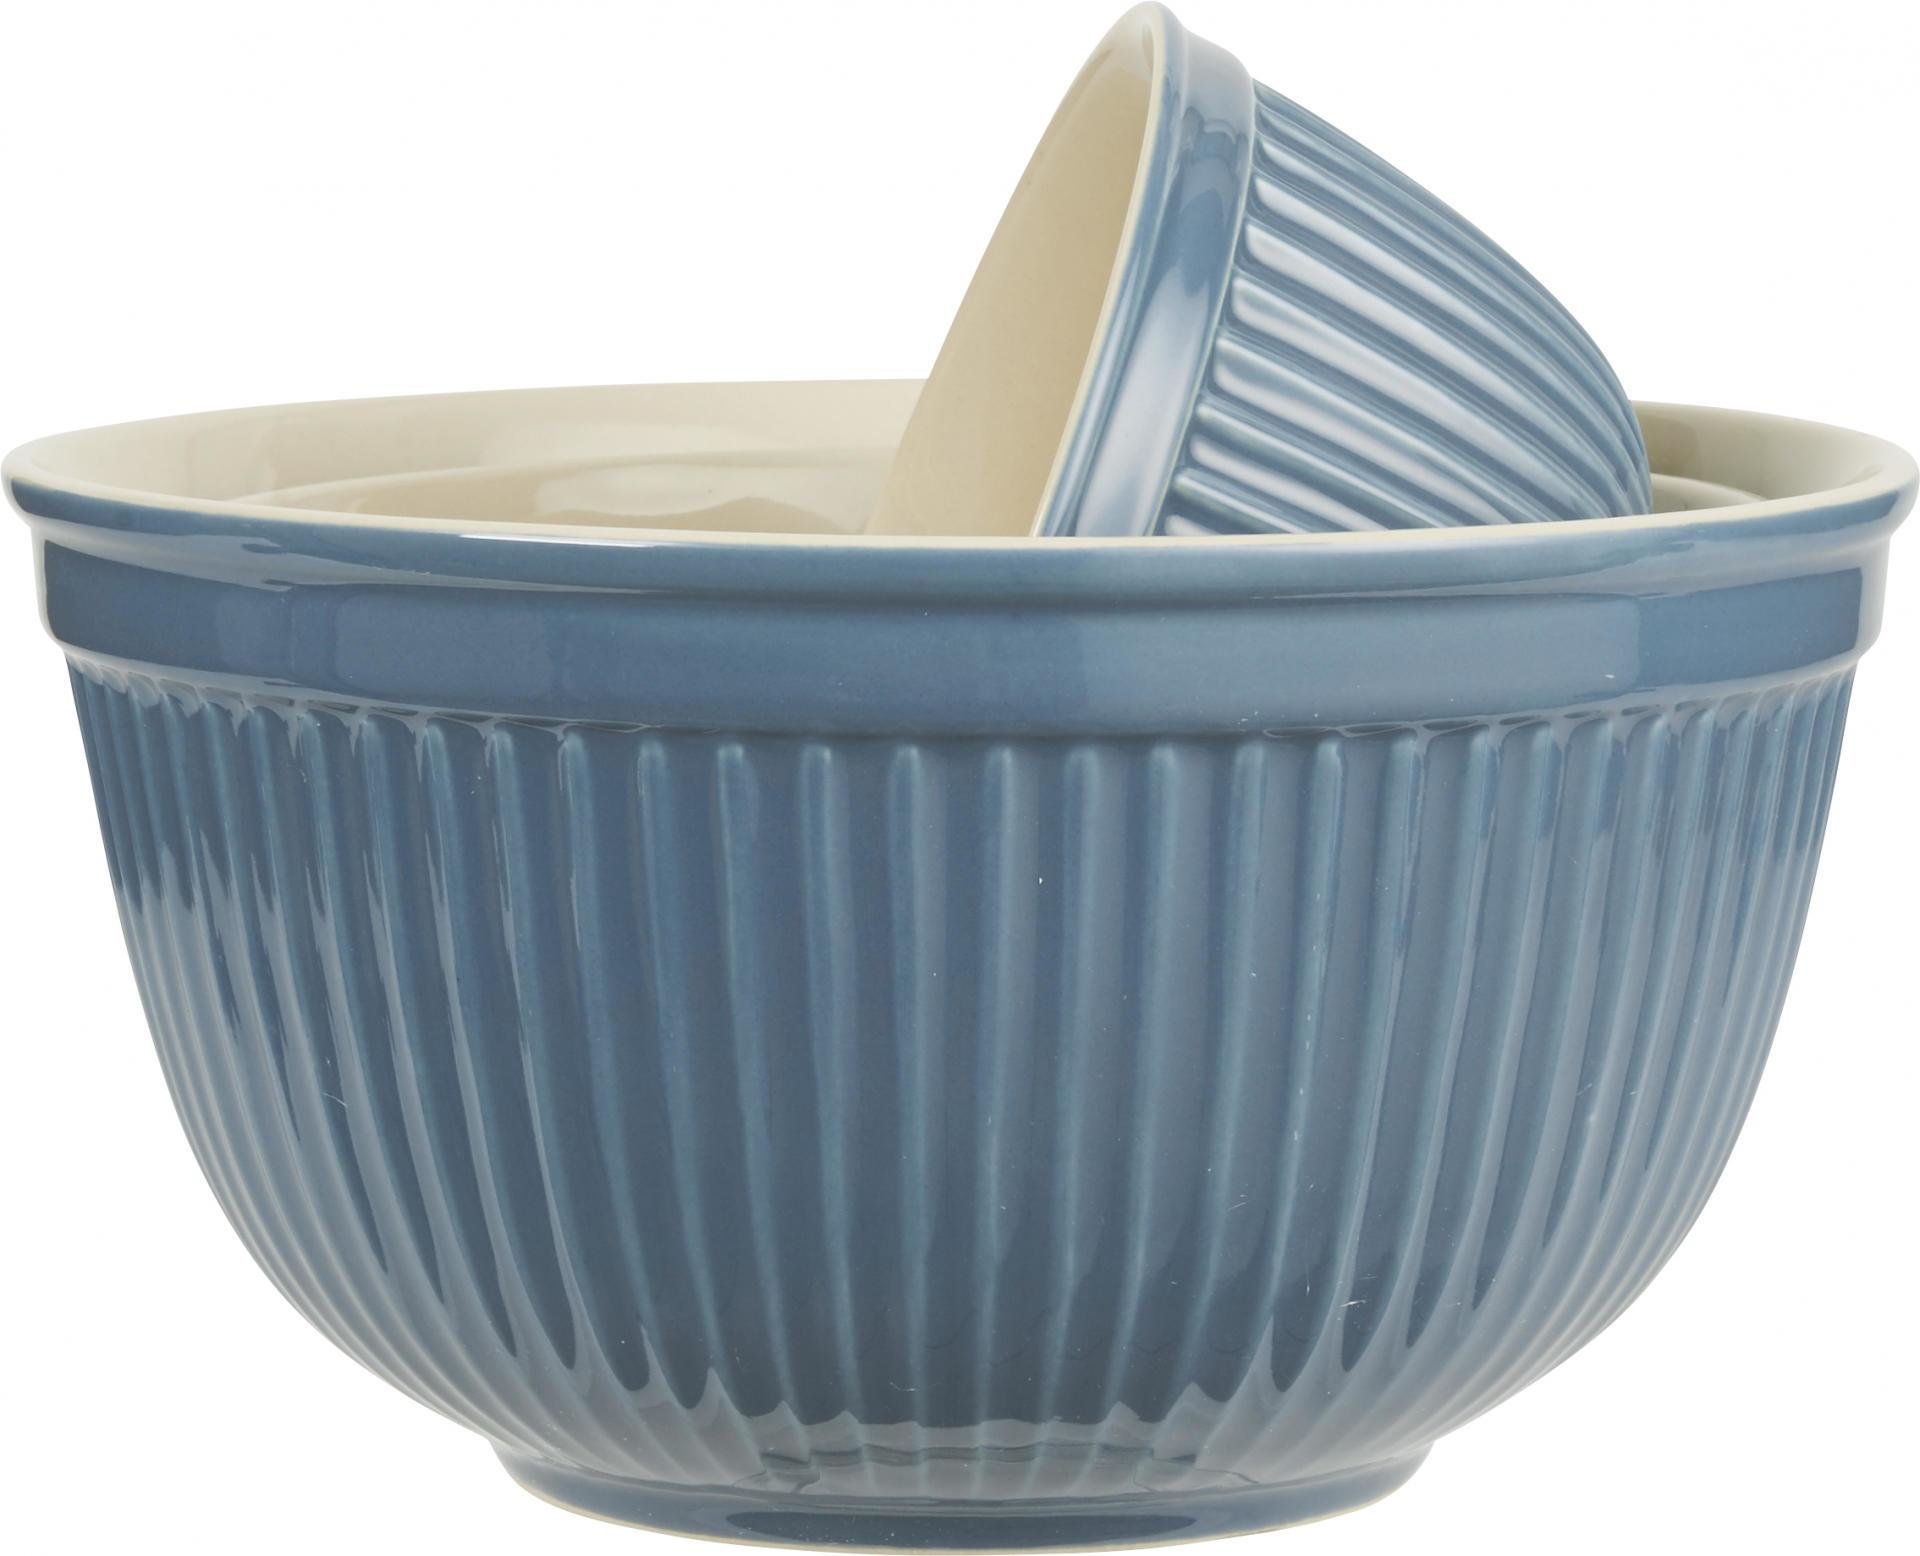 IB LAURSEN Keramická mísa Mynte Cornflower Velikost S, modrá barva, keramika